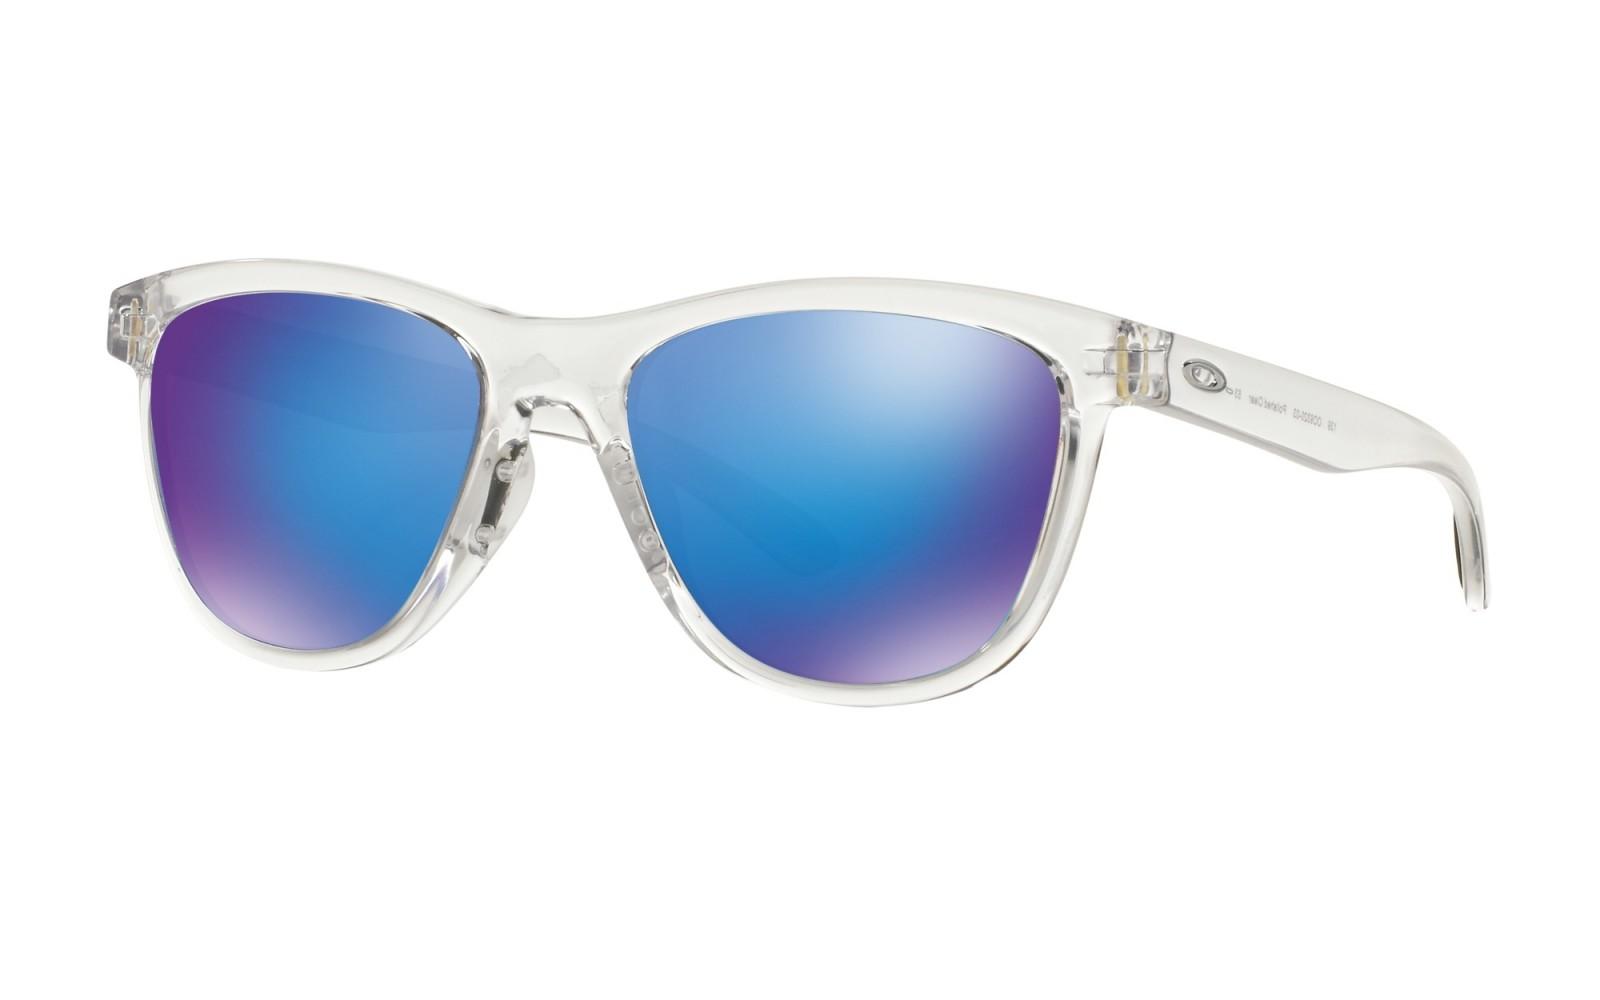 Oakley Moonlighter - Frost / Sapphire Iridium - OO9320-03 Zonnebril